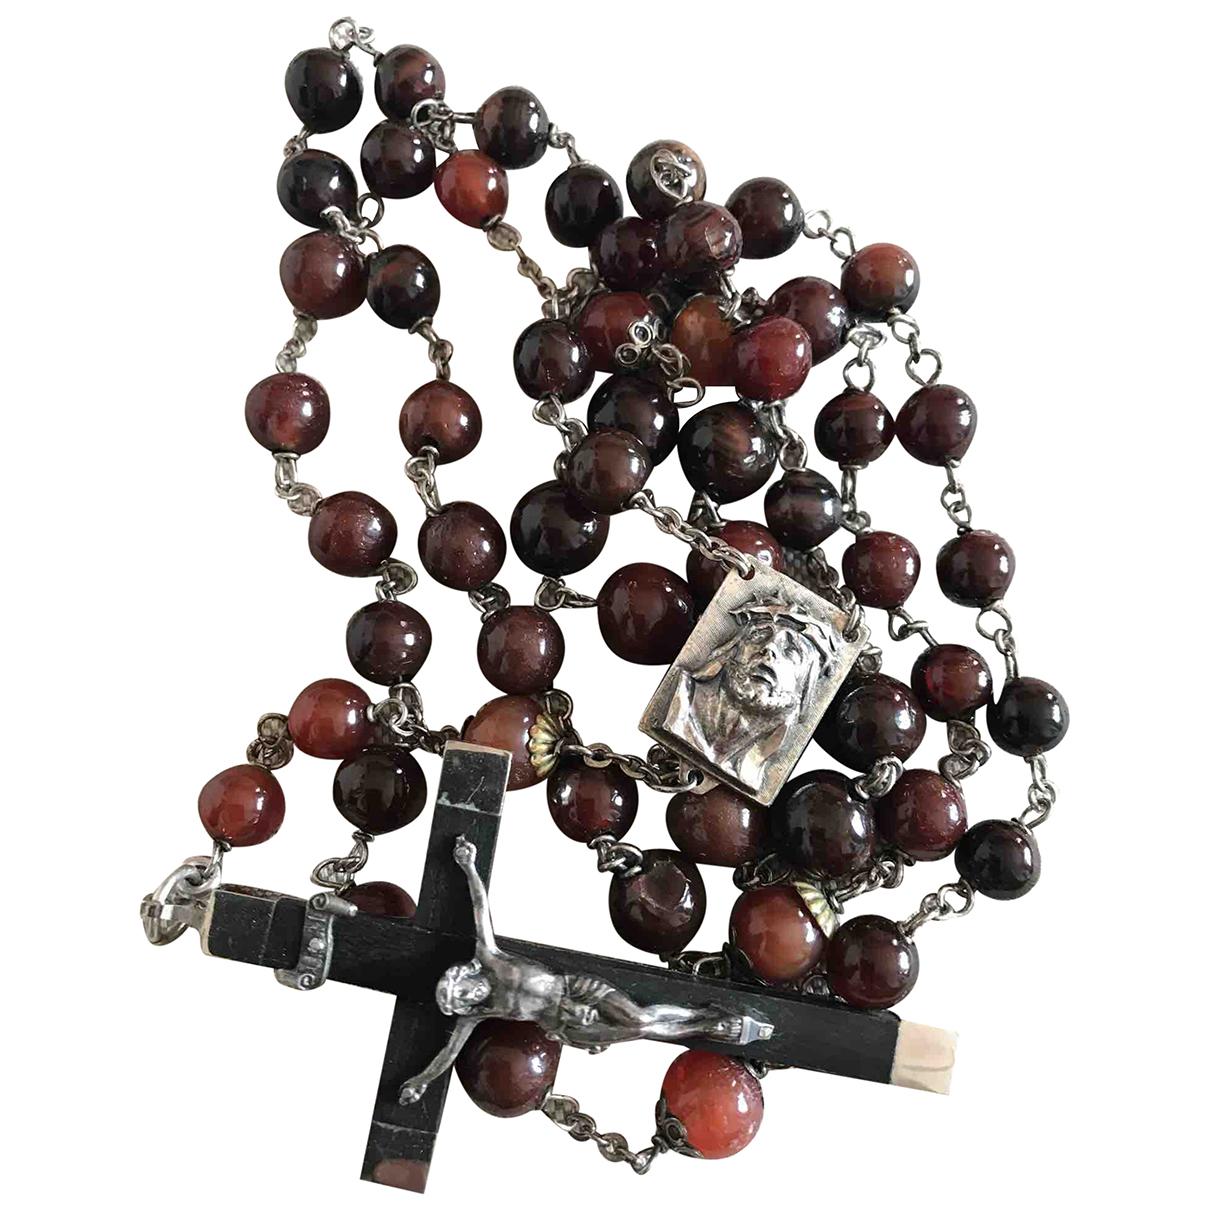 Collar largo Motifs Religieux de Plata Non Signe / Unsigned